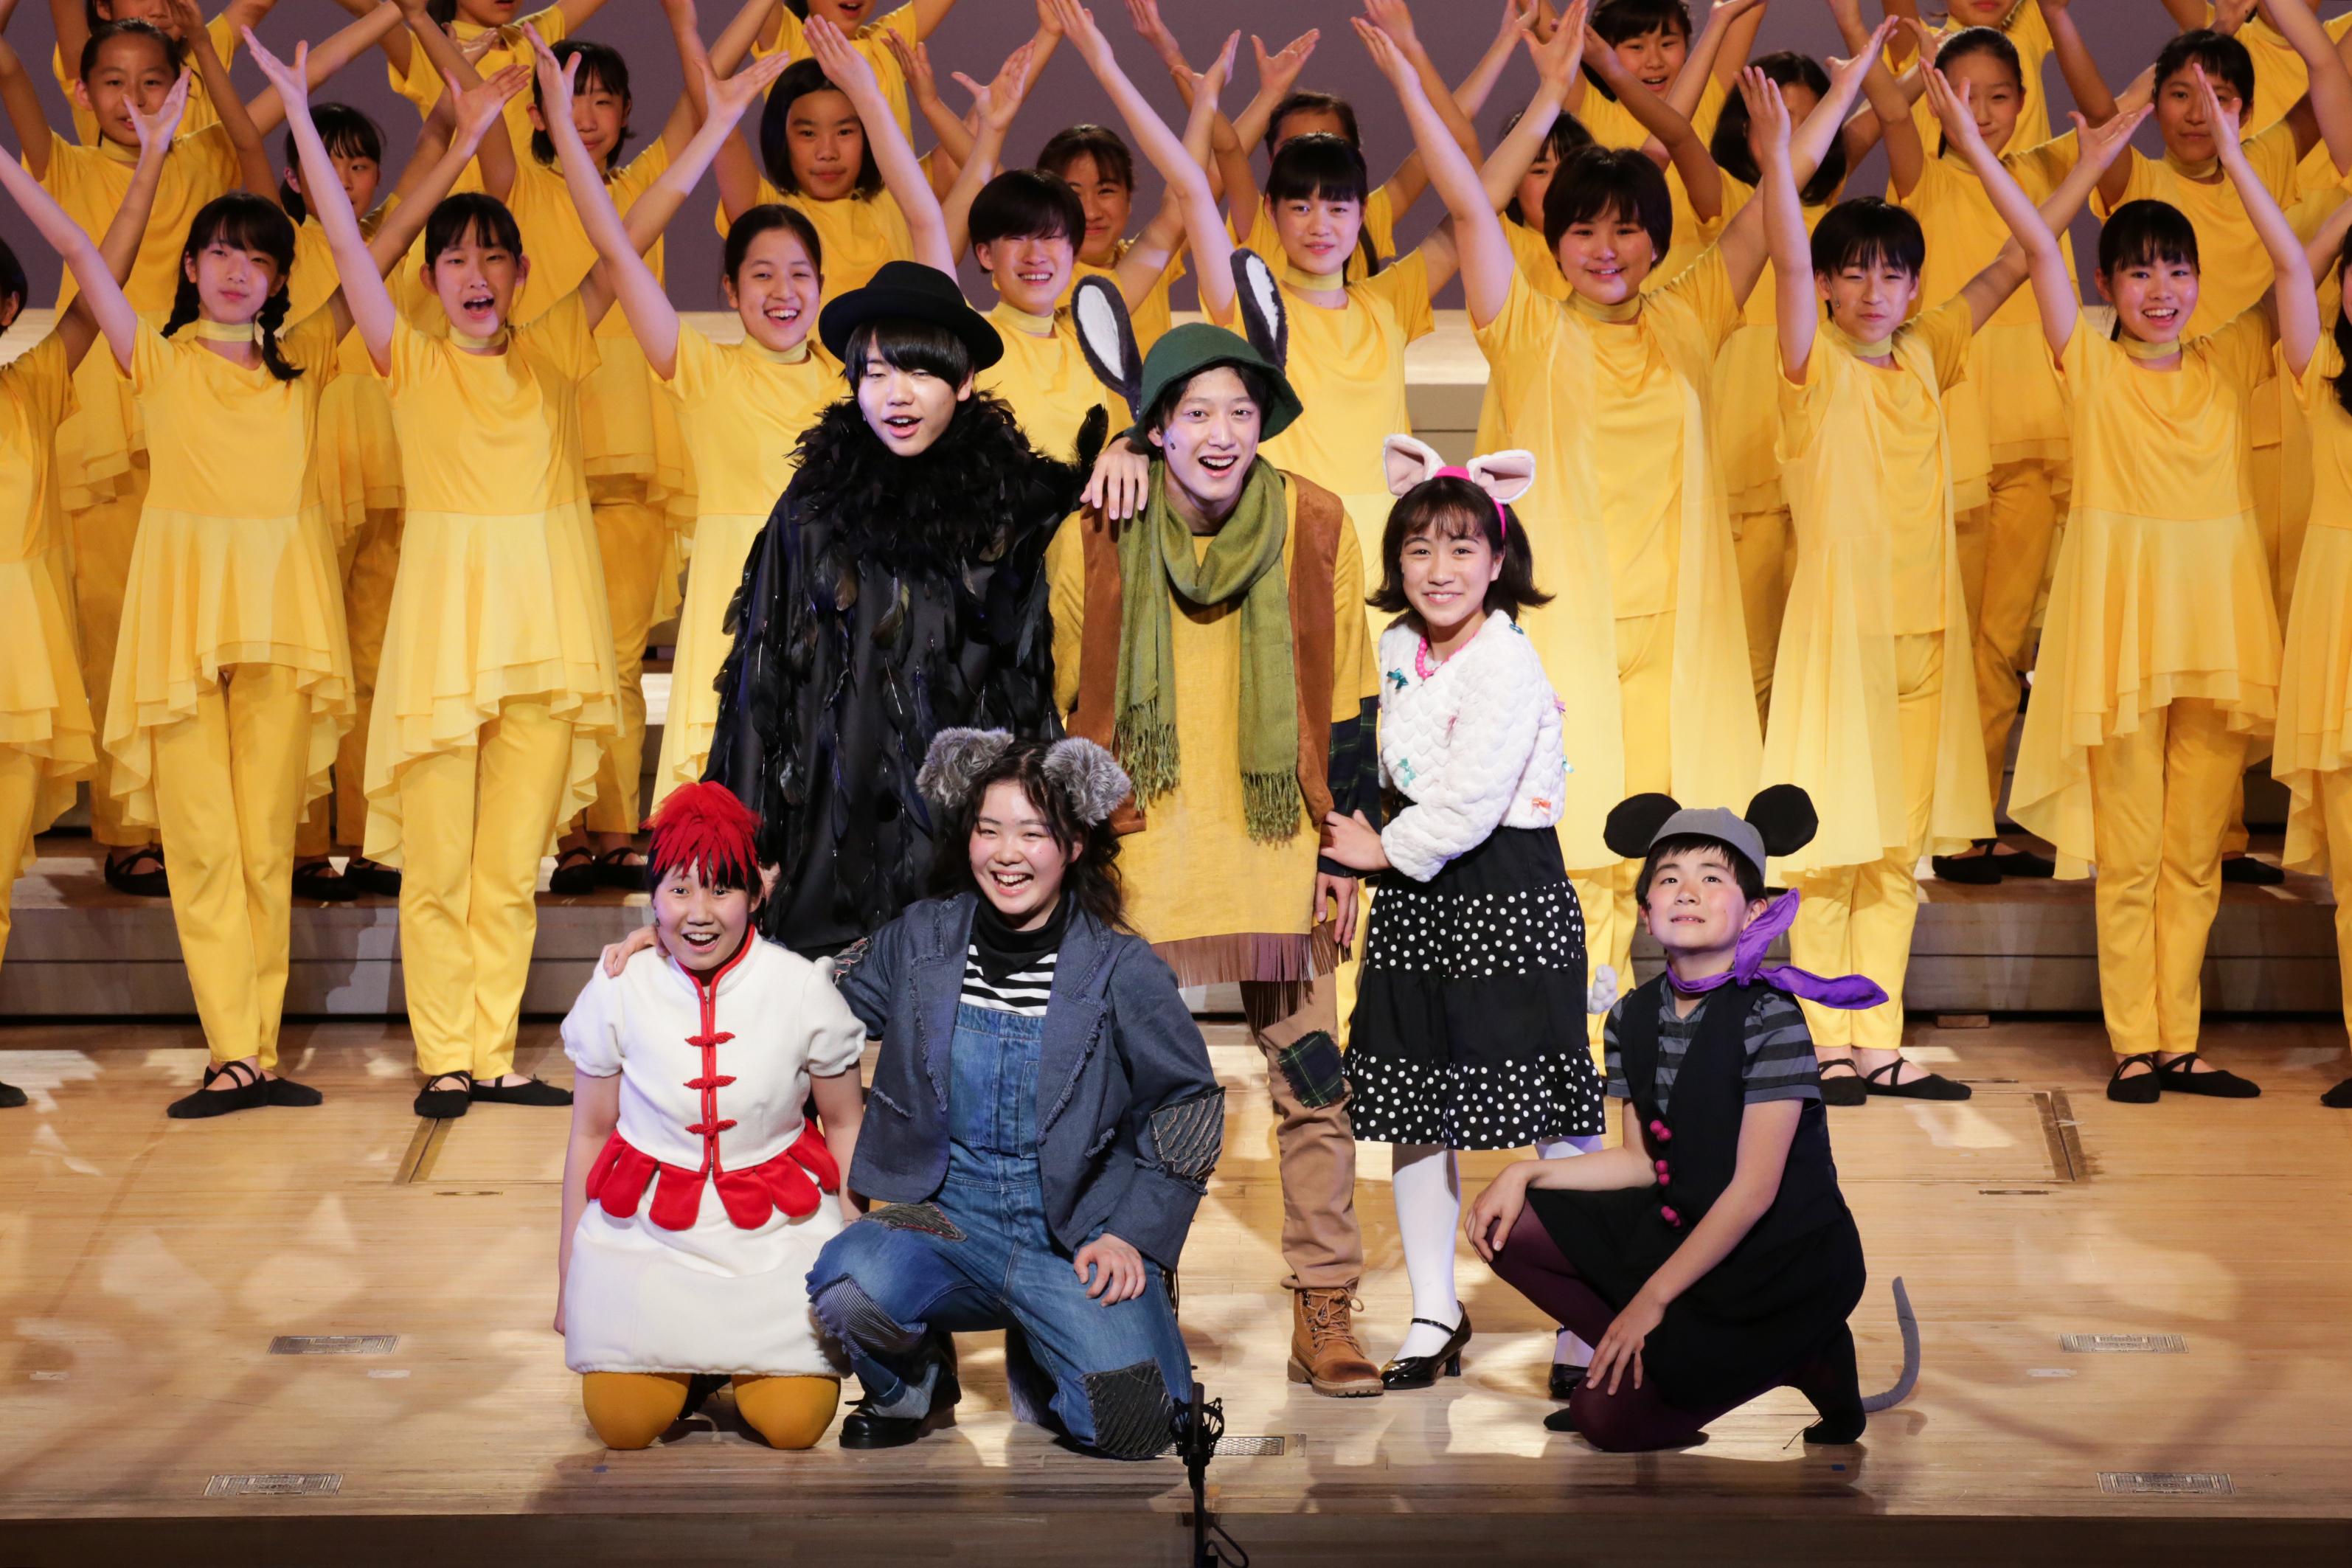 http://mj-hall.jp/performance/010808sugiji9.jpg